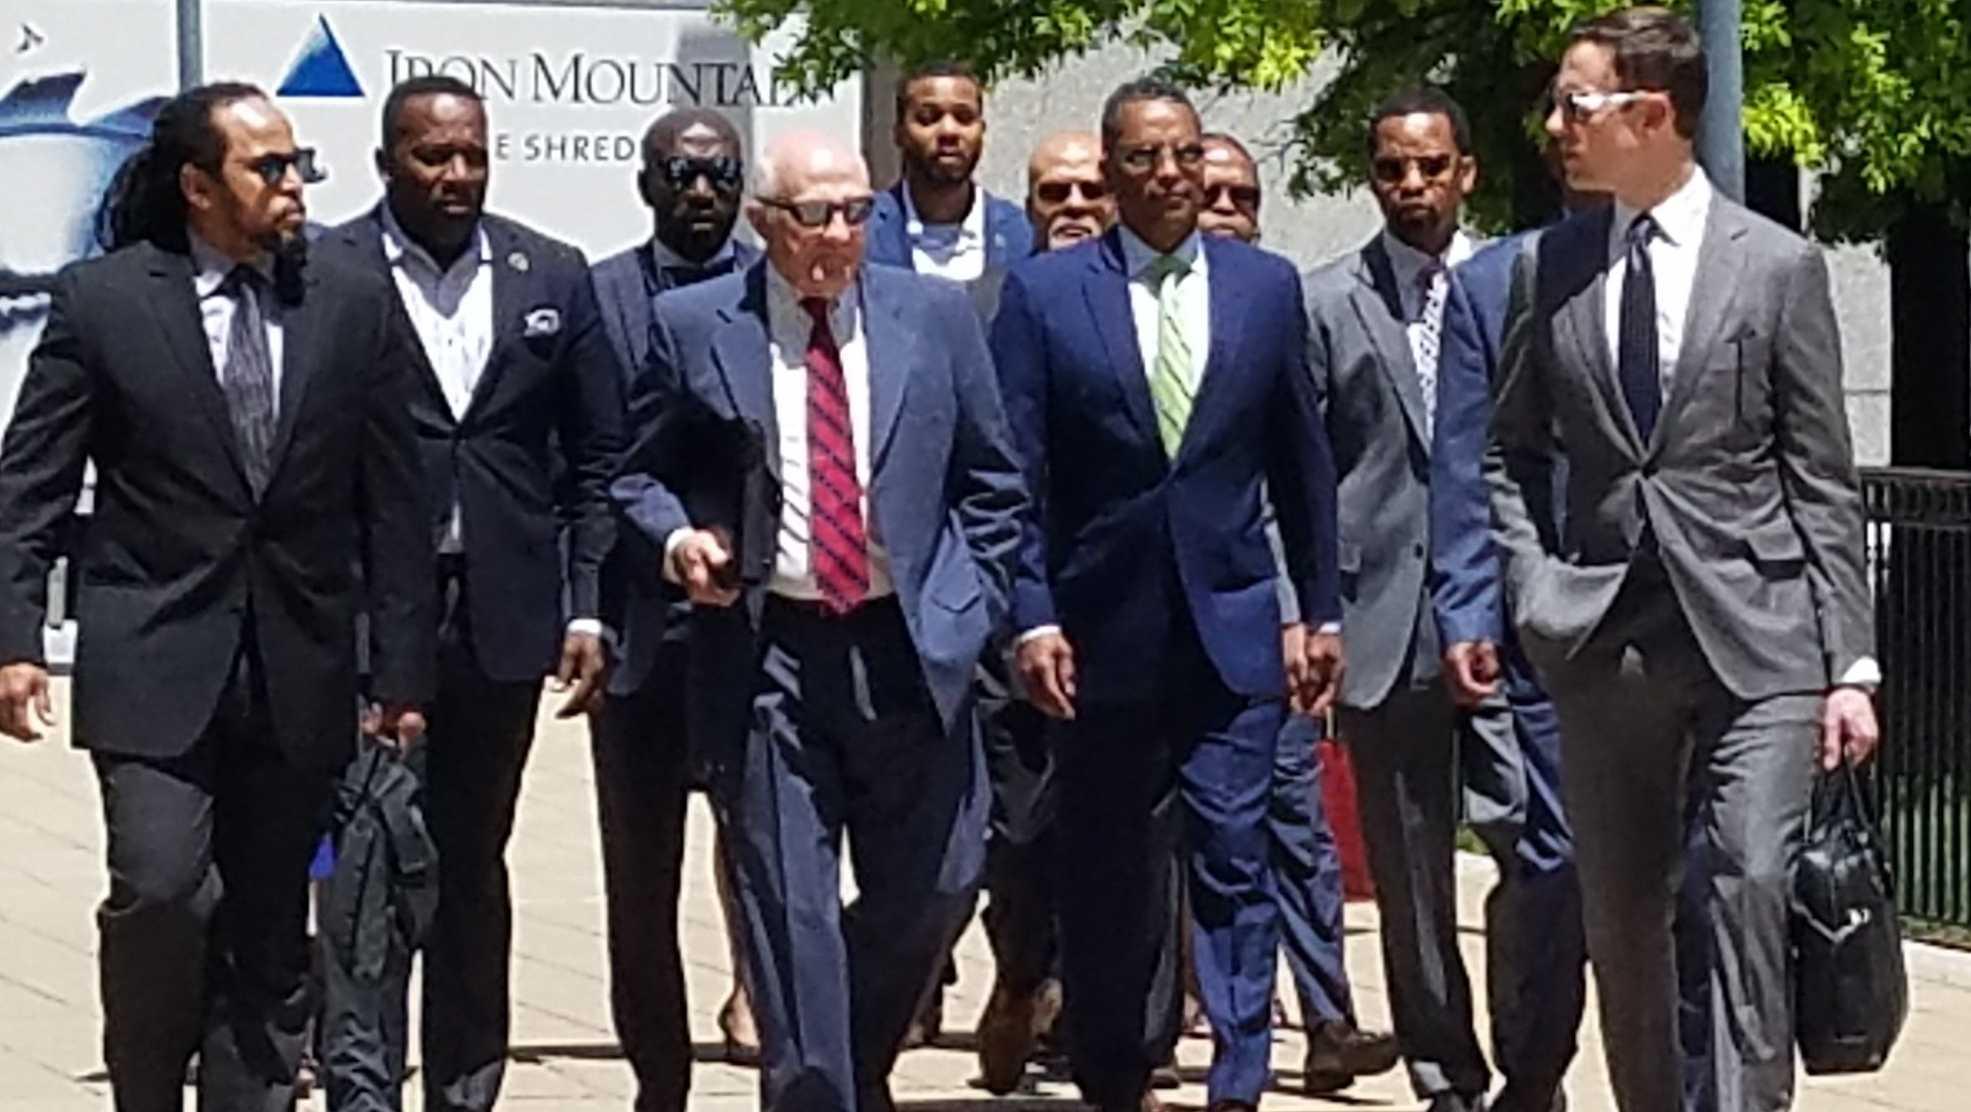 Darryl De Sousa arrives at federal court